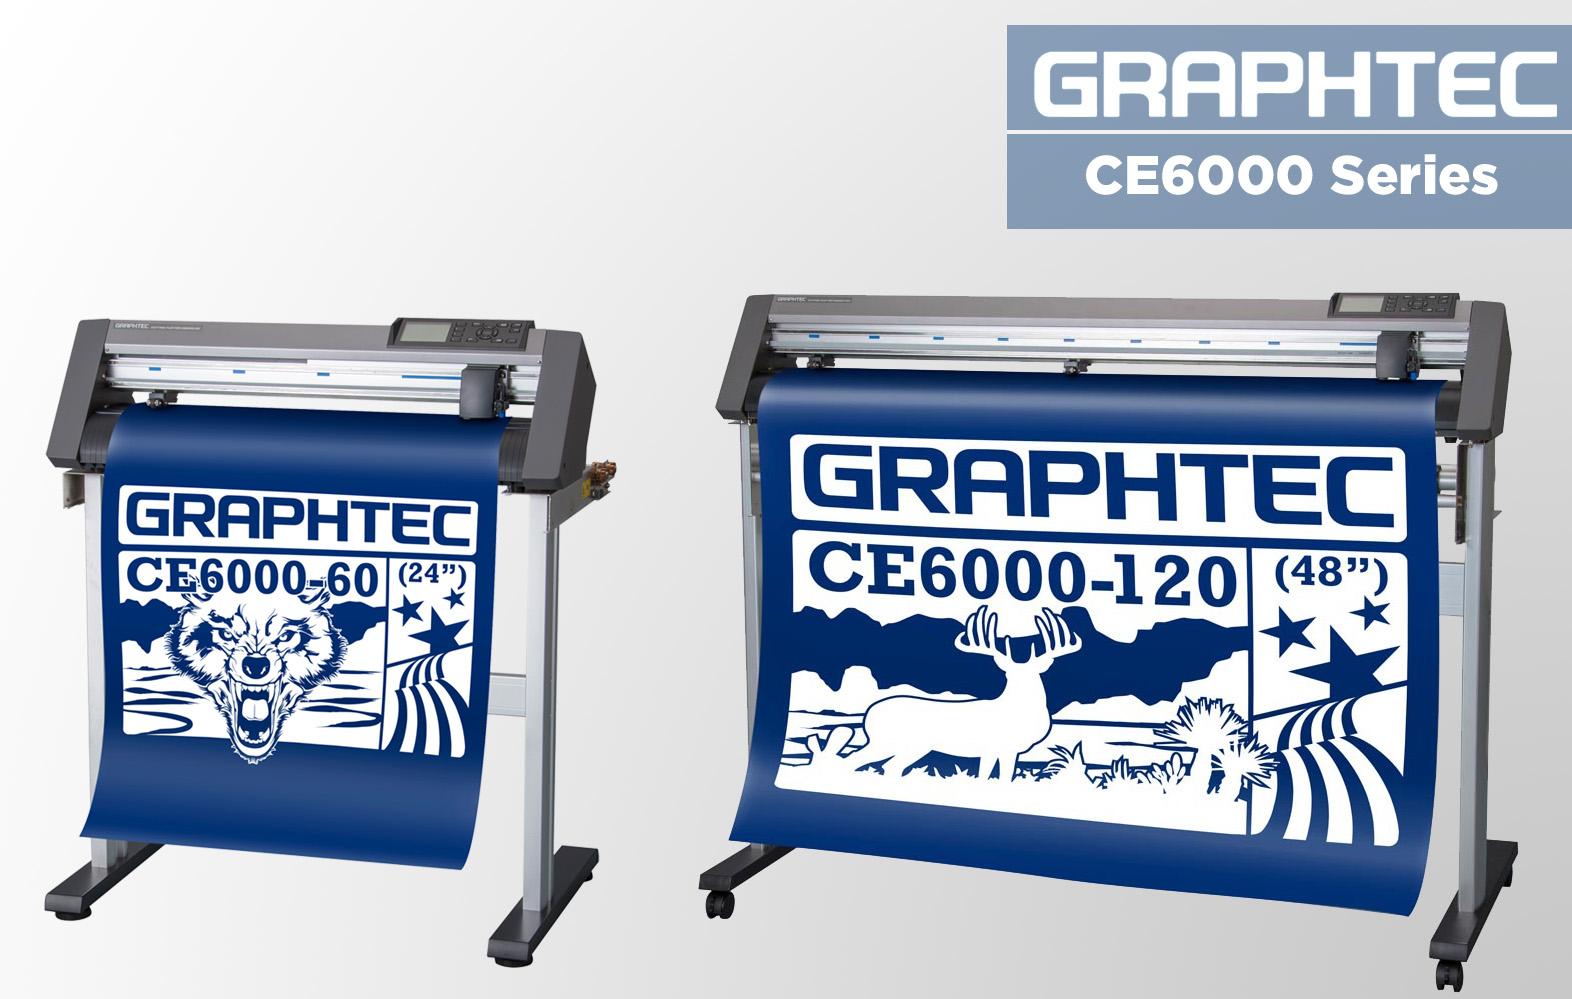 graphtec-ce6000-series